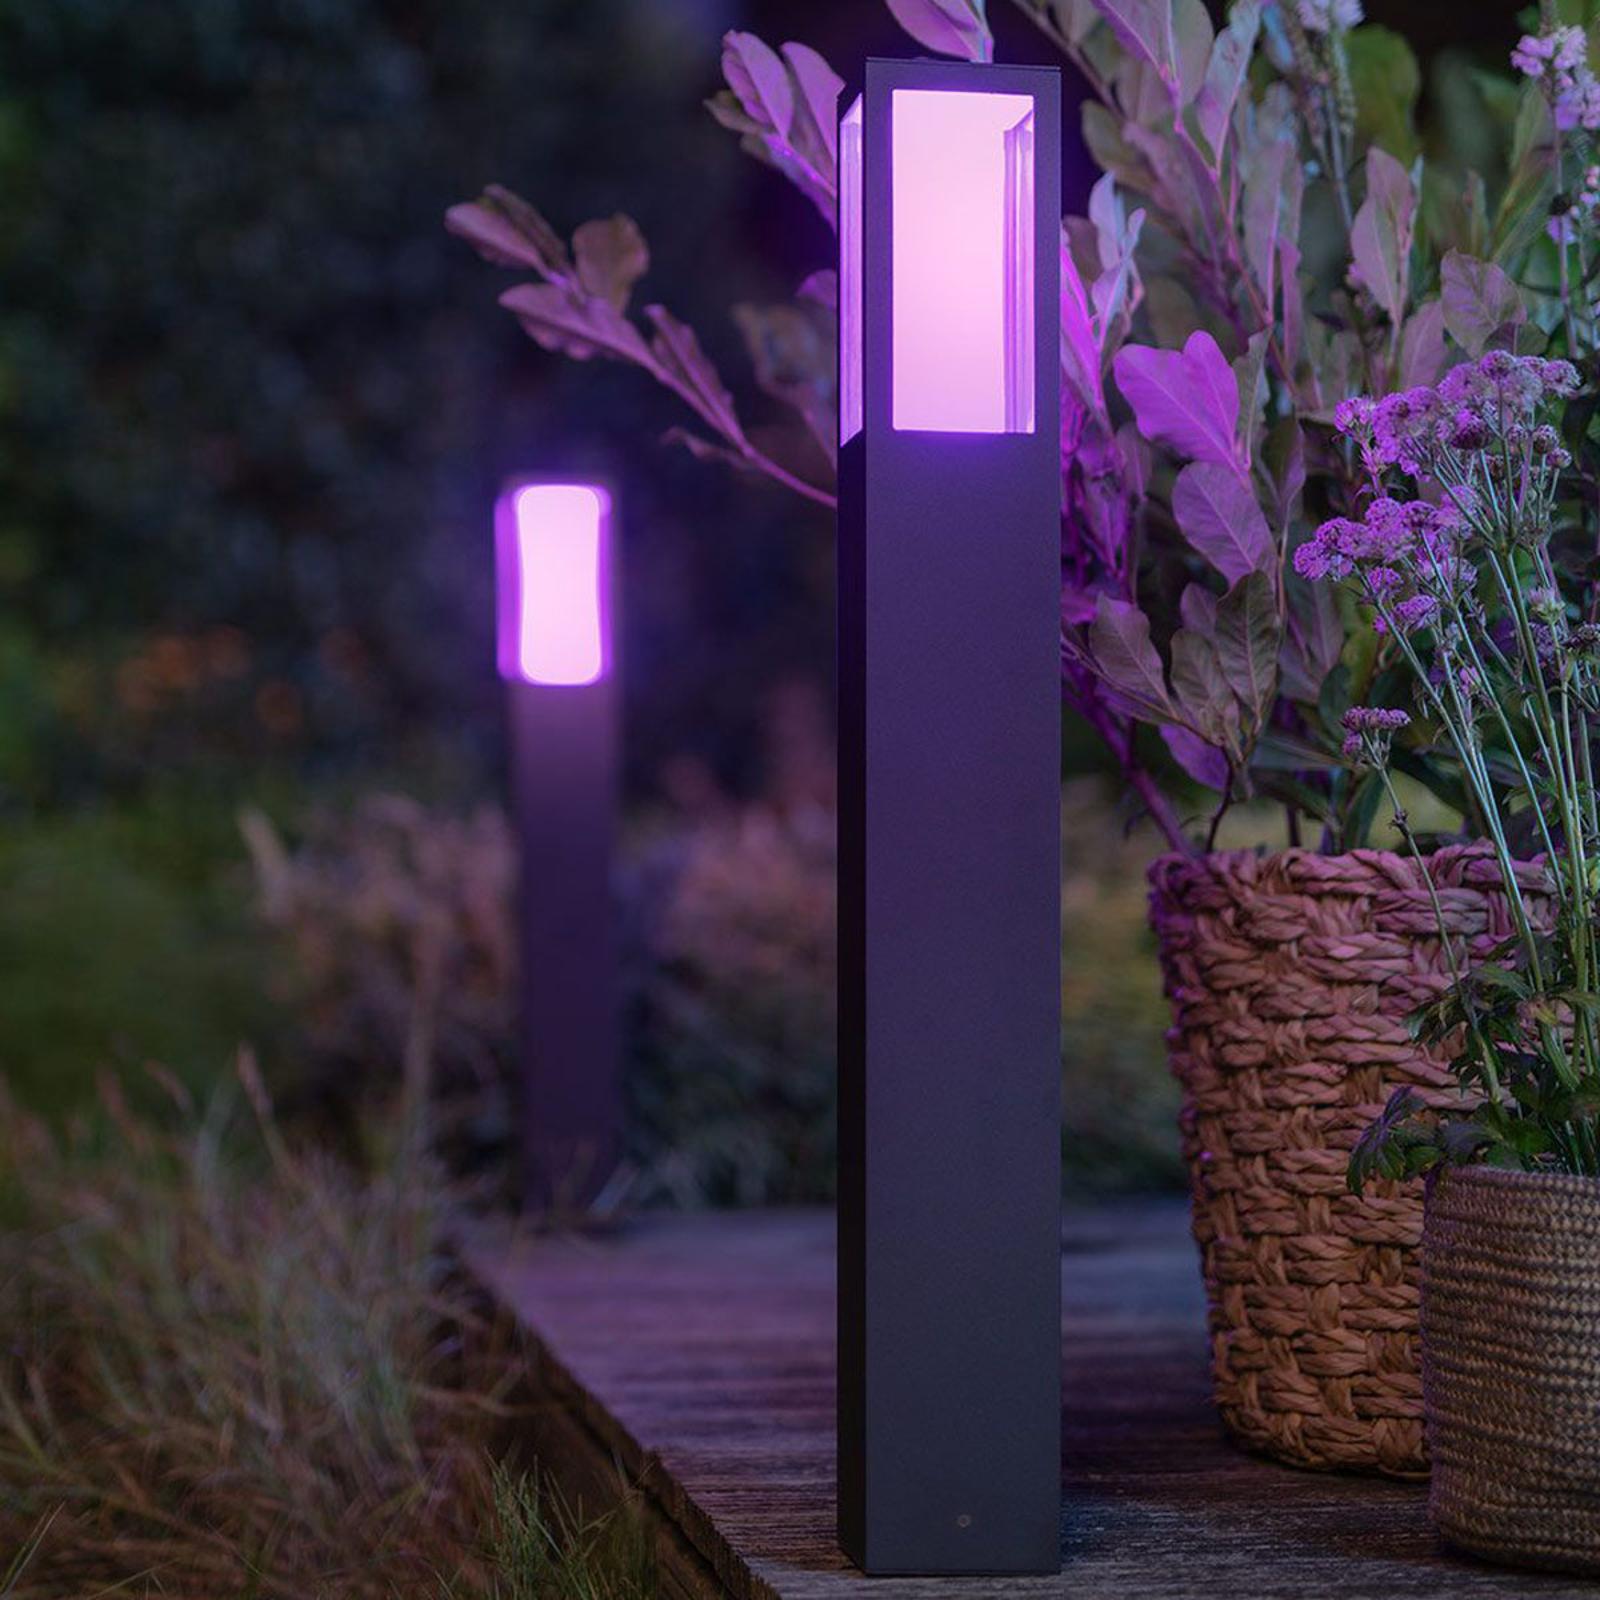 Philips Hue White+Color Impress lampione a LED